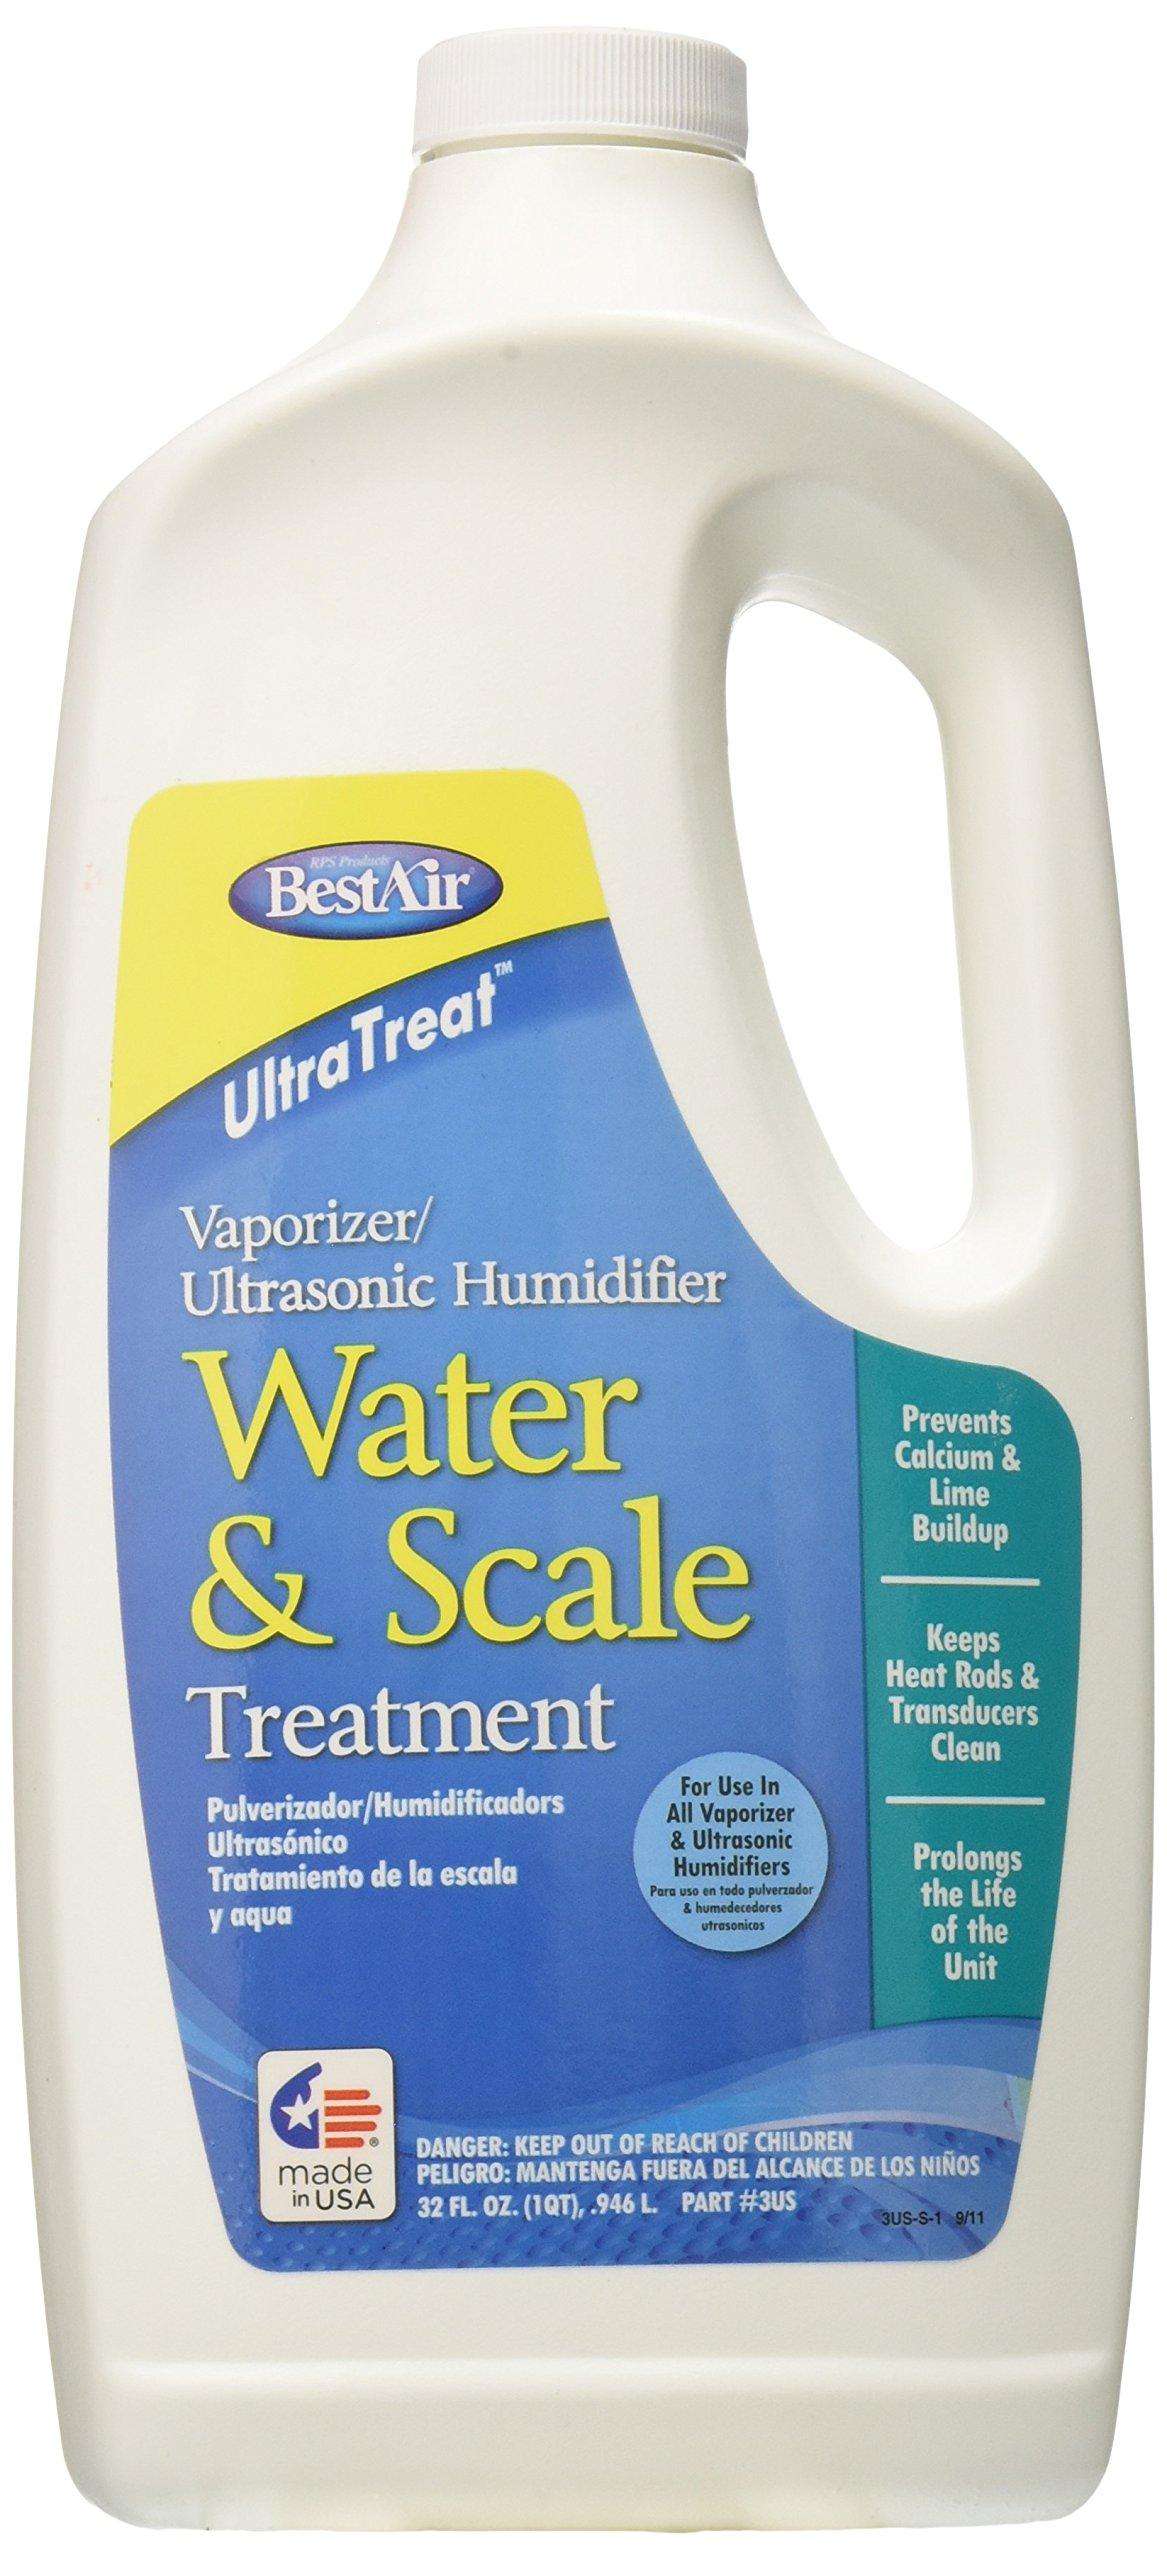 BestAir 3US, UltraTreat Ultrasonic/ Vaporizer Water & Scale Treatment, 32 oz, 6 pack by BestAir